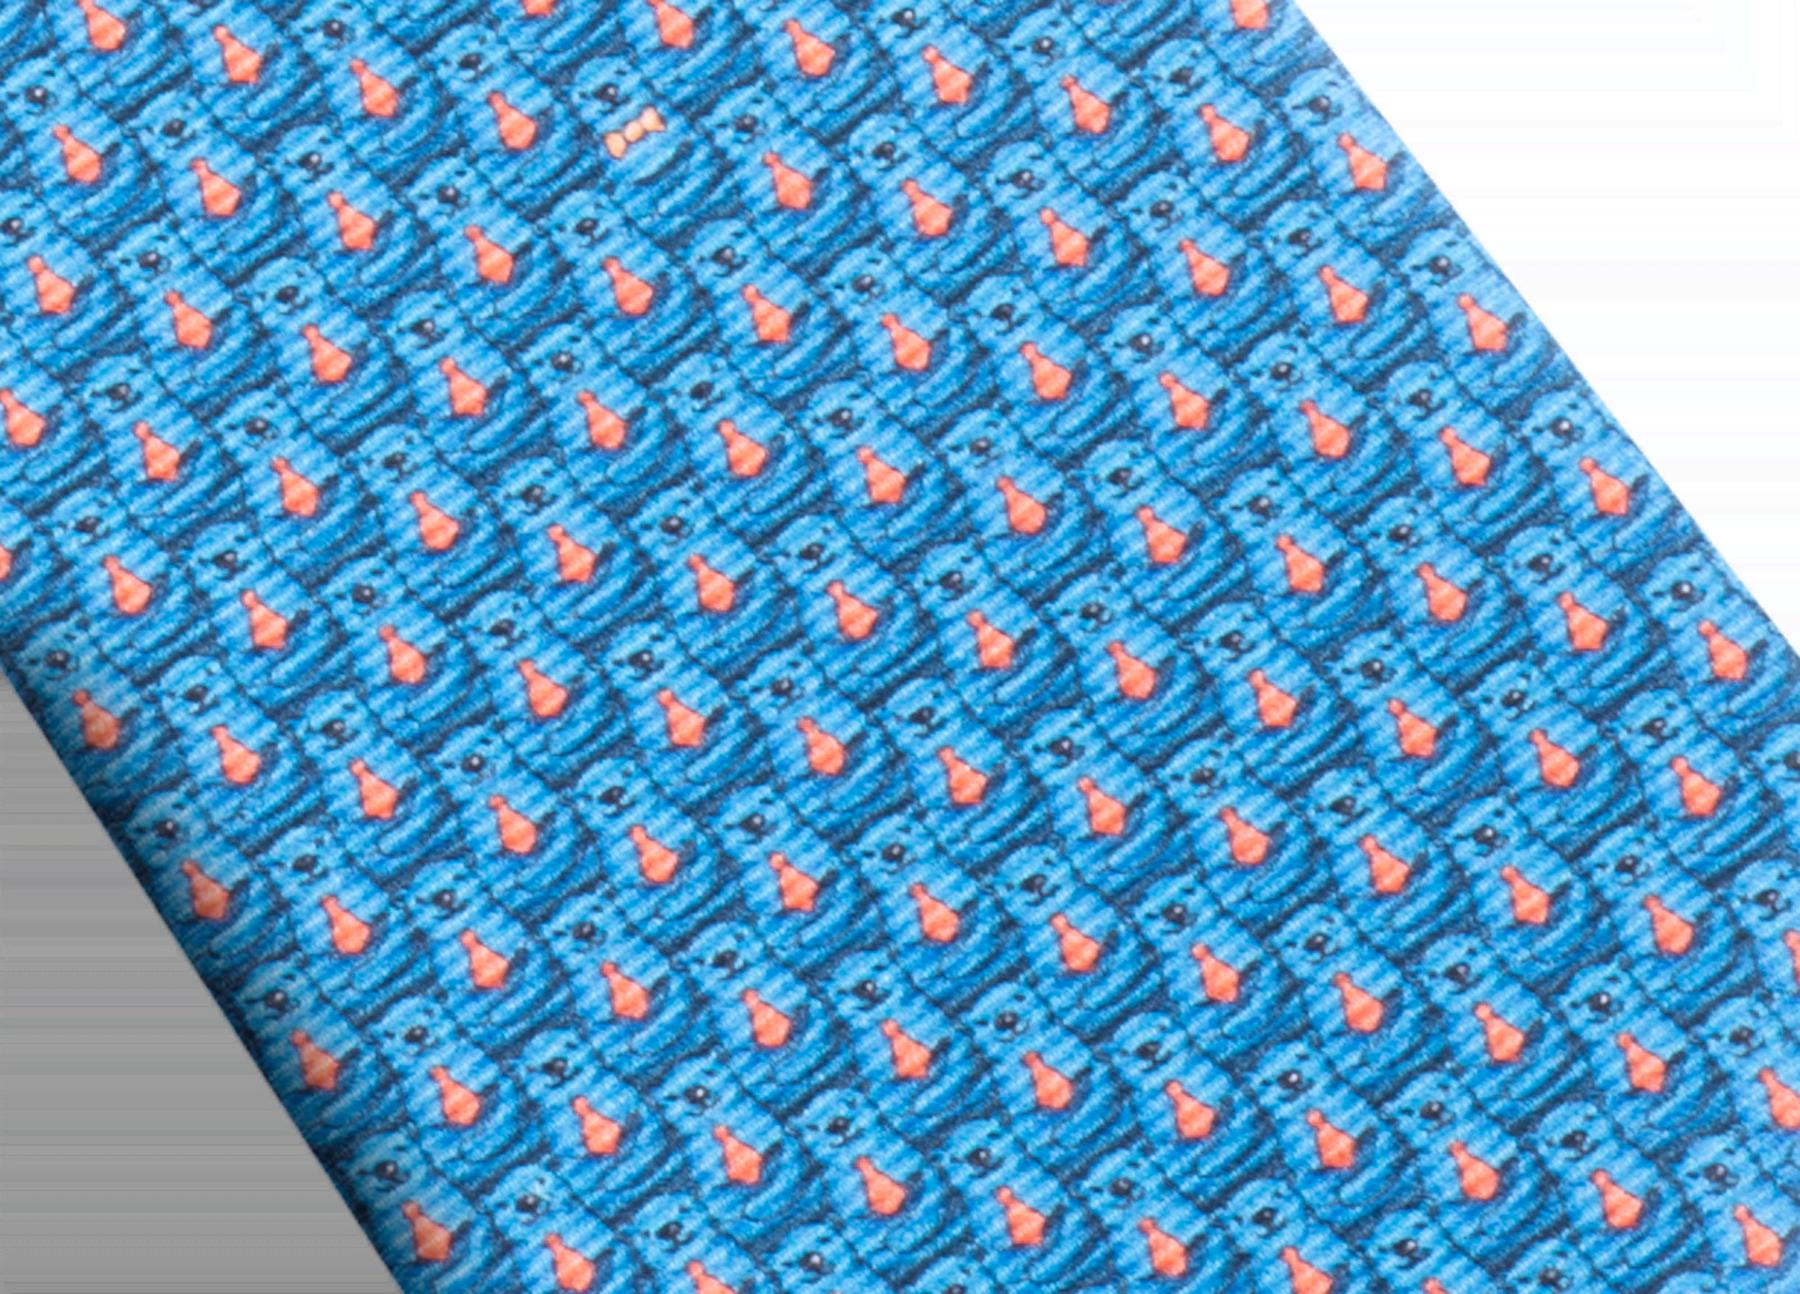 Dark blue Bear Daddy pattern seven-folds tie in fine saglione printed silk. 243622 image 2